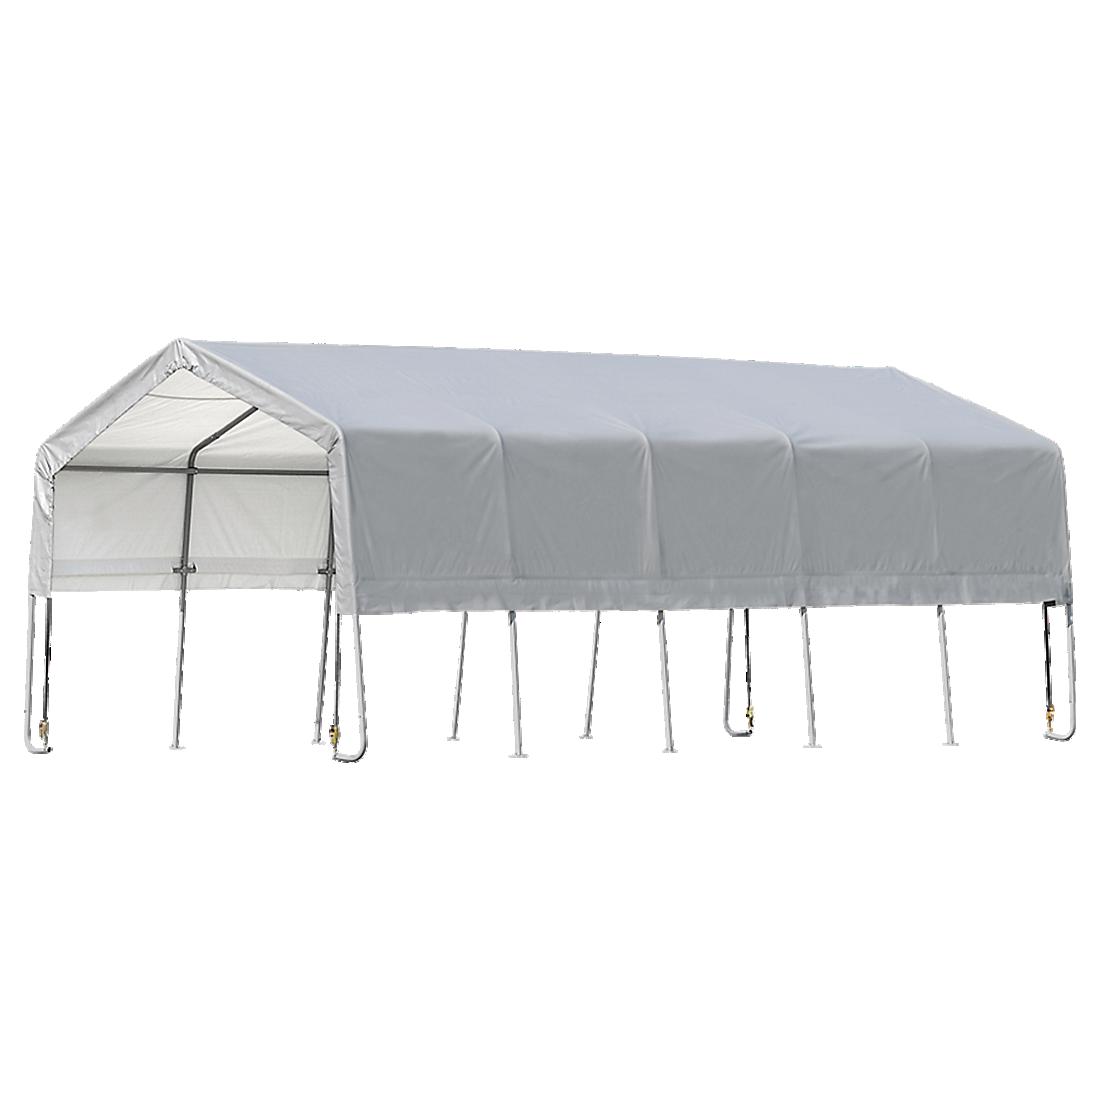 Carport-in-a-Box® 12 x 20 x 8 ft.